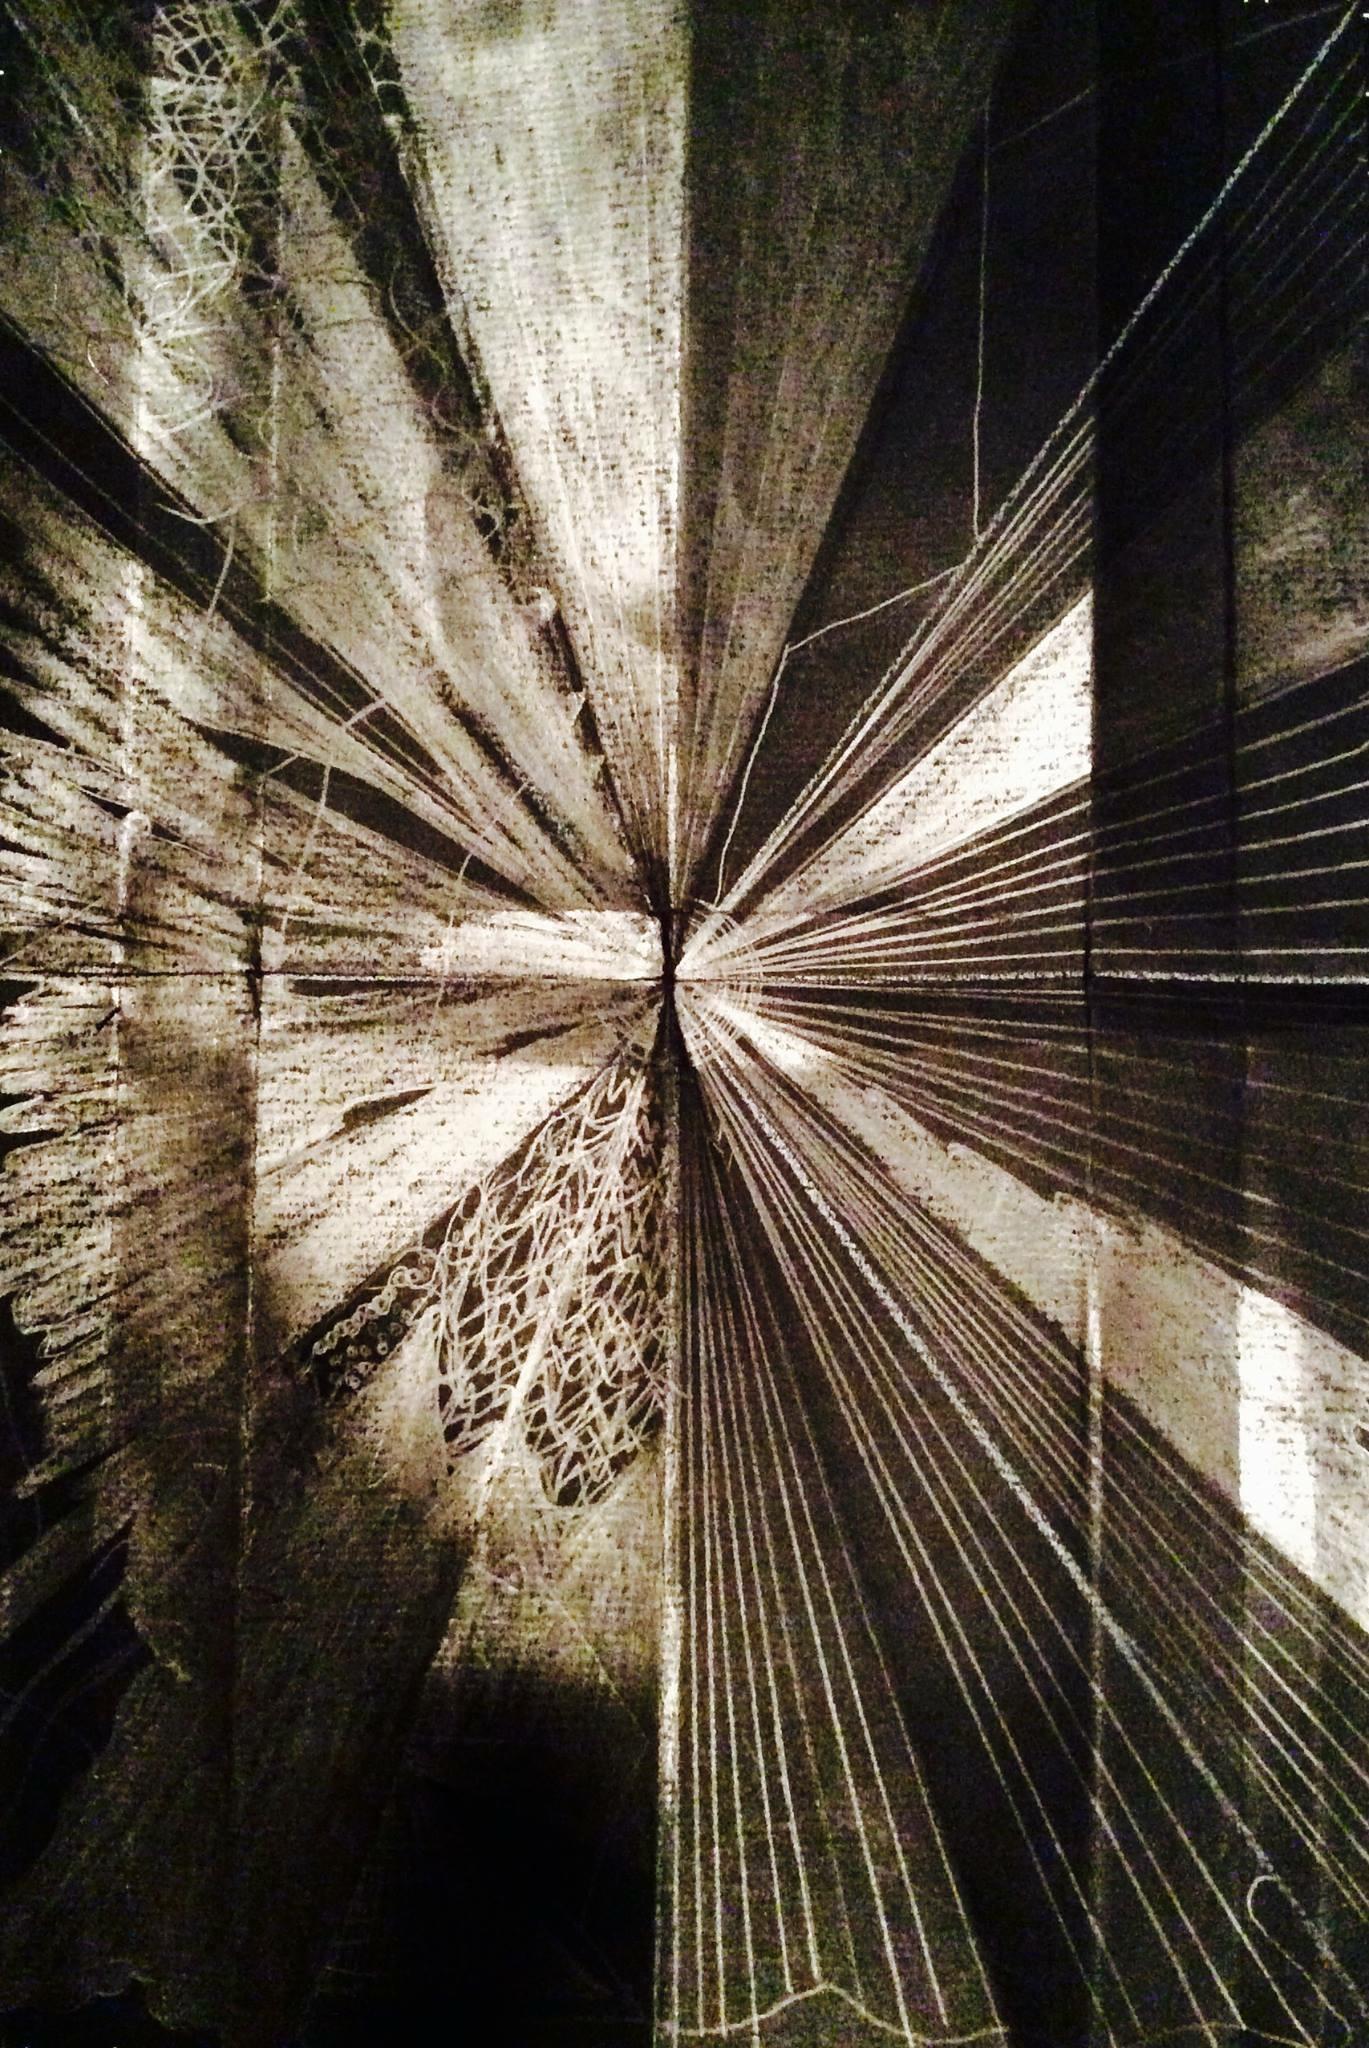 2015, reconfigurable sculpture, variable dimensions